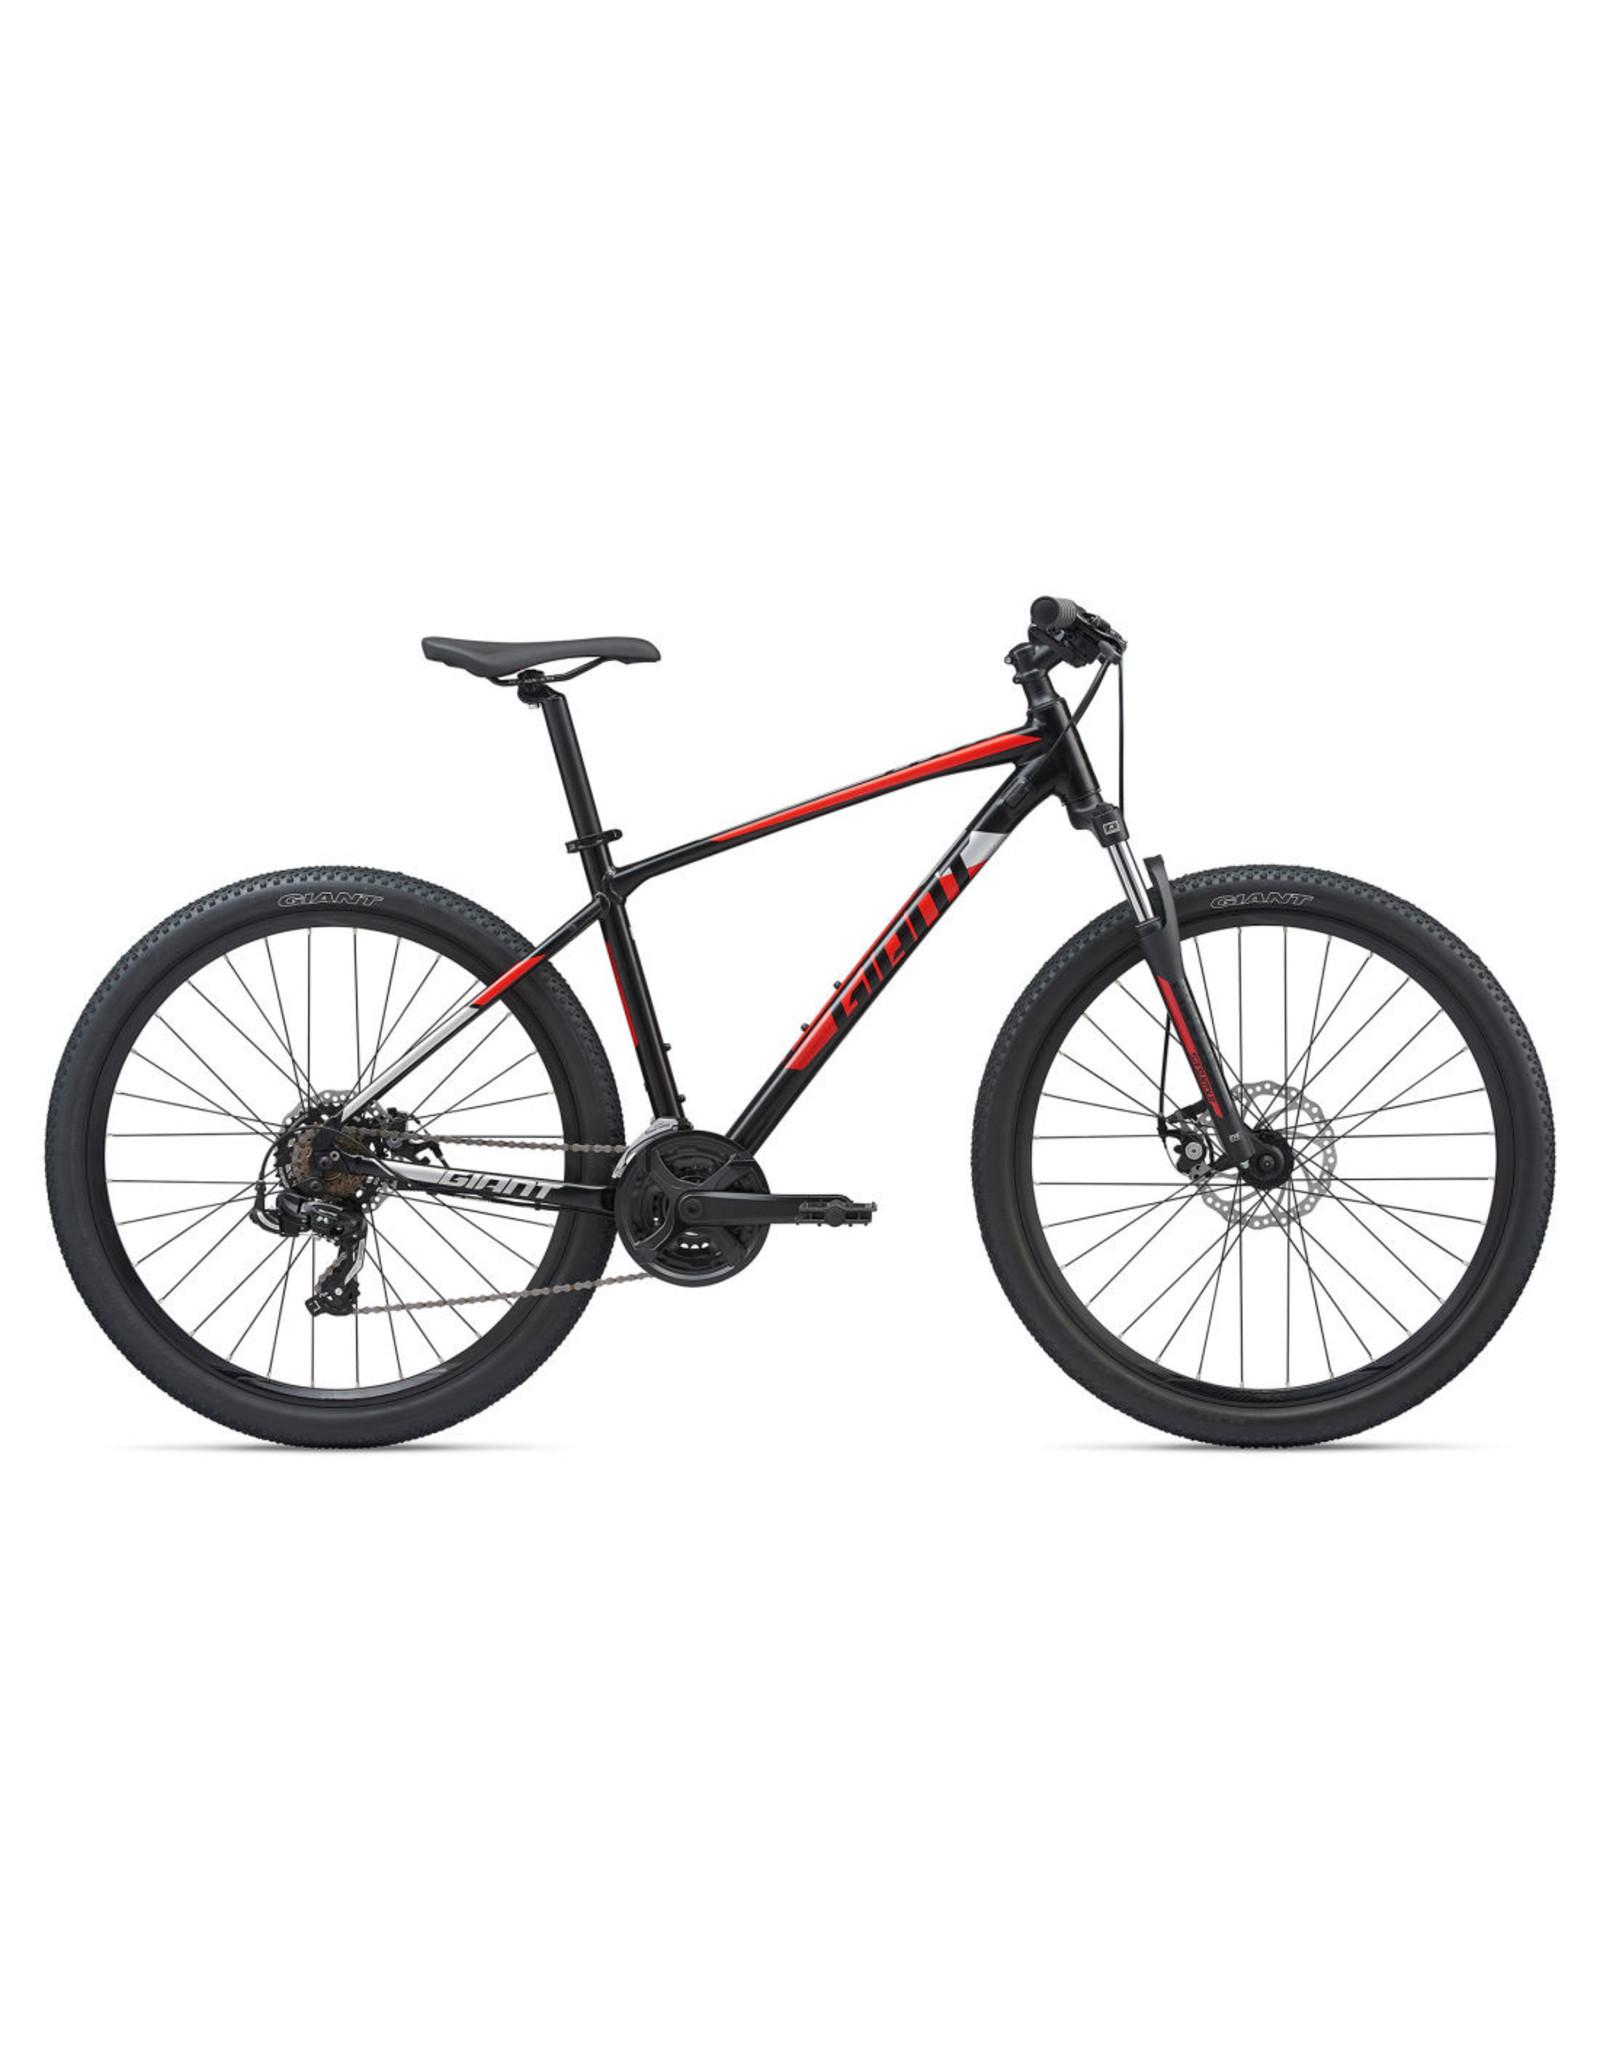 Giant ATX 3 27.5 L Black/Pure Red